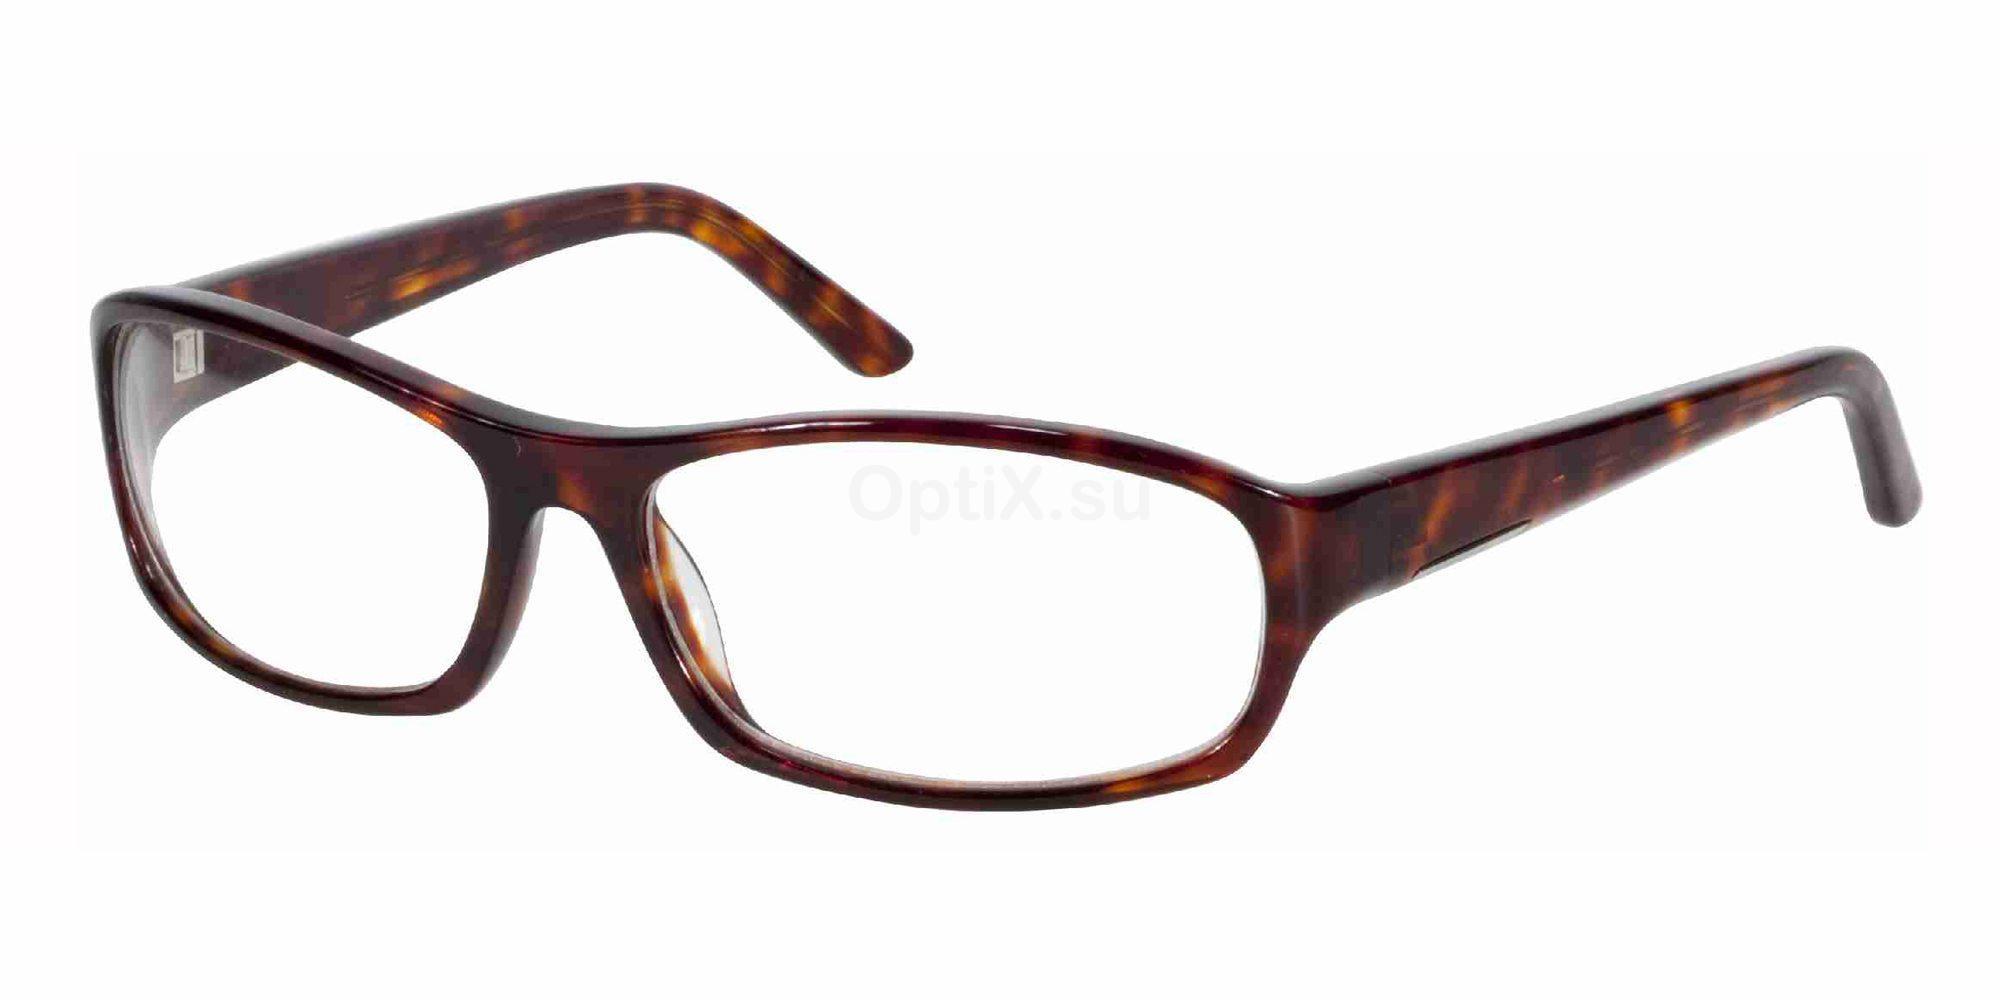 8651 31007 Glasses, JAGUAR Eyewear